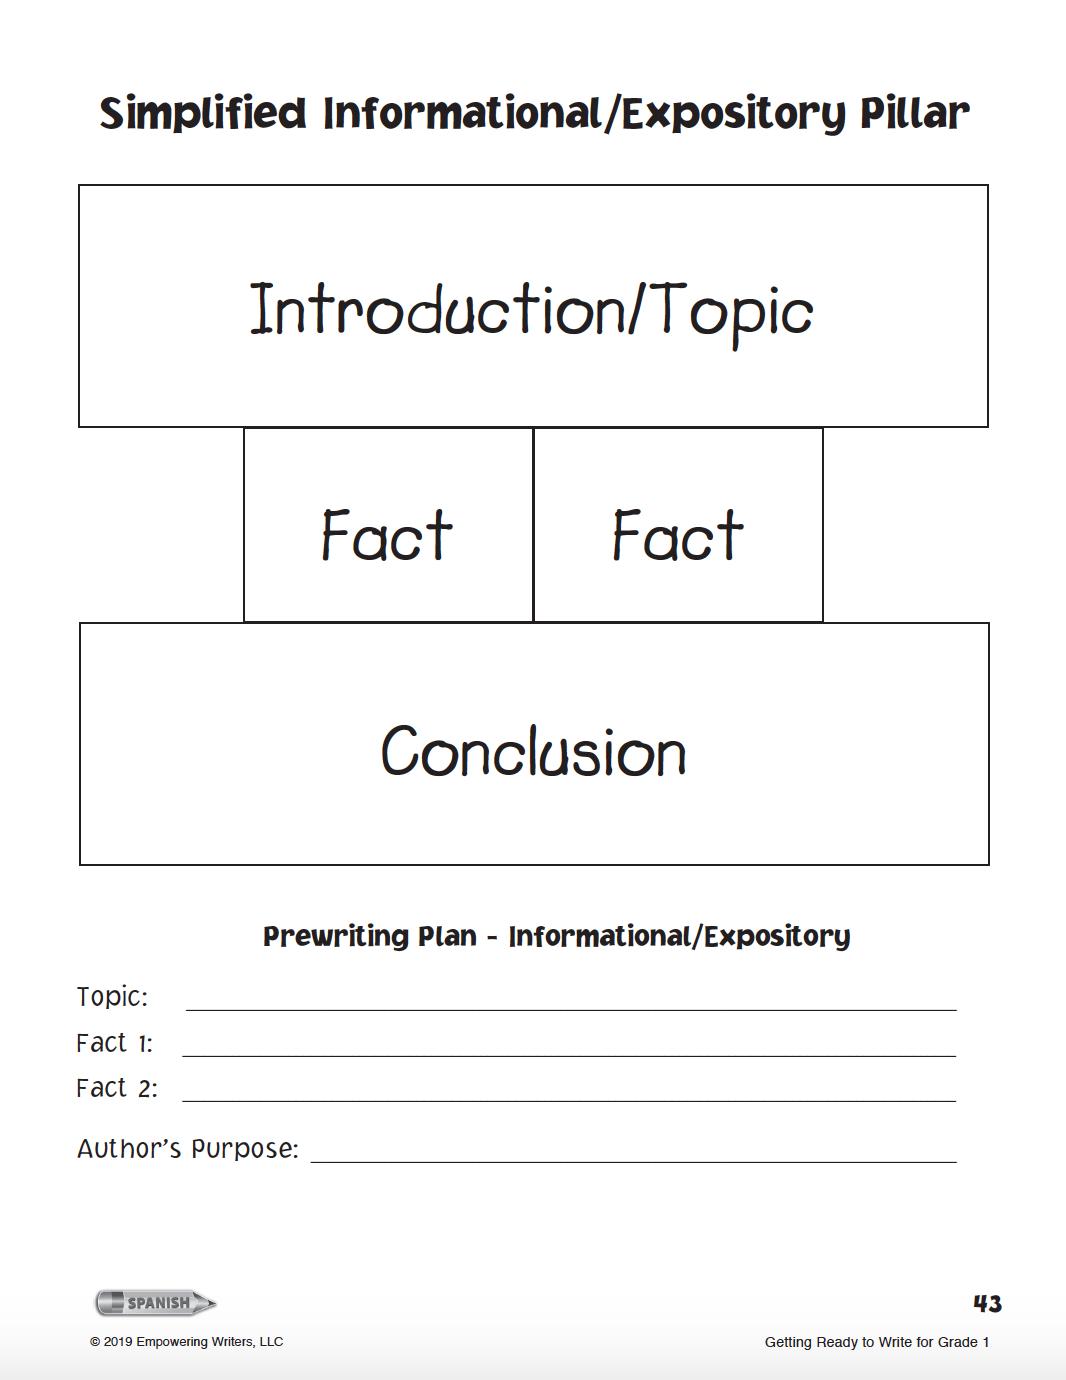 The Simplified Informational Pillar